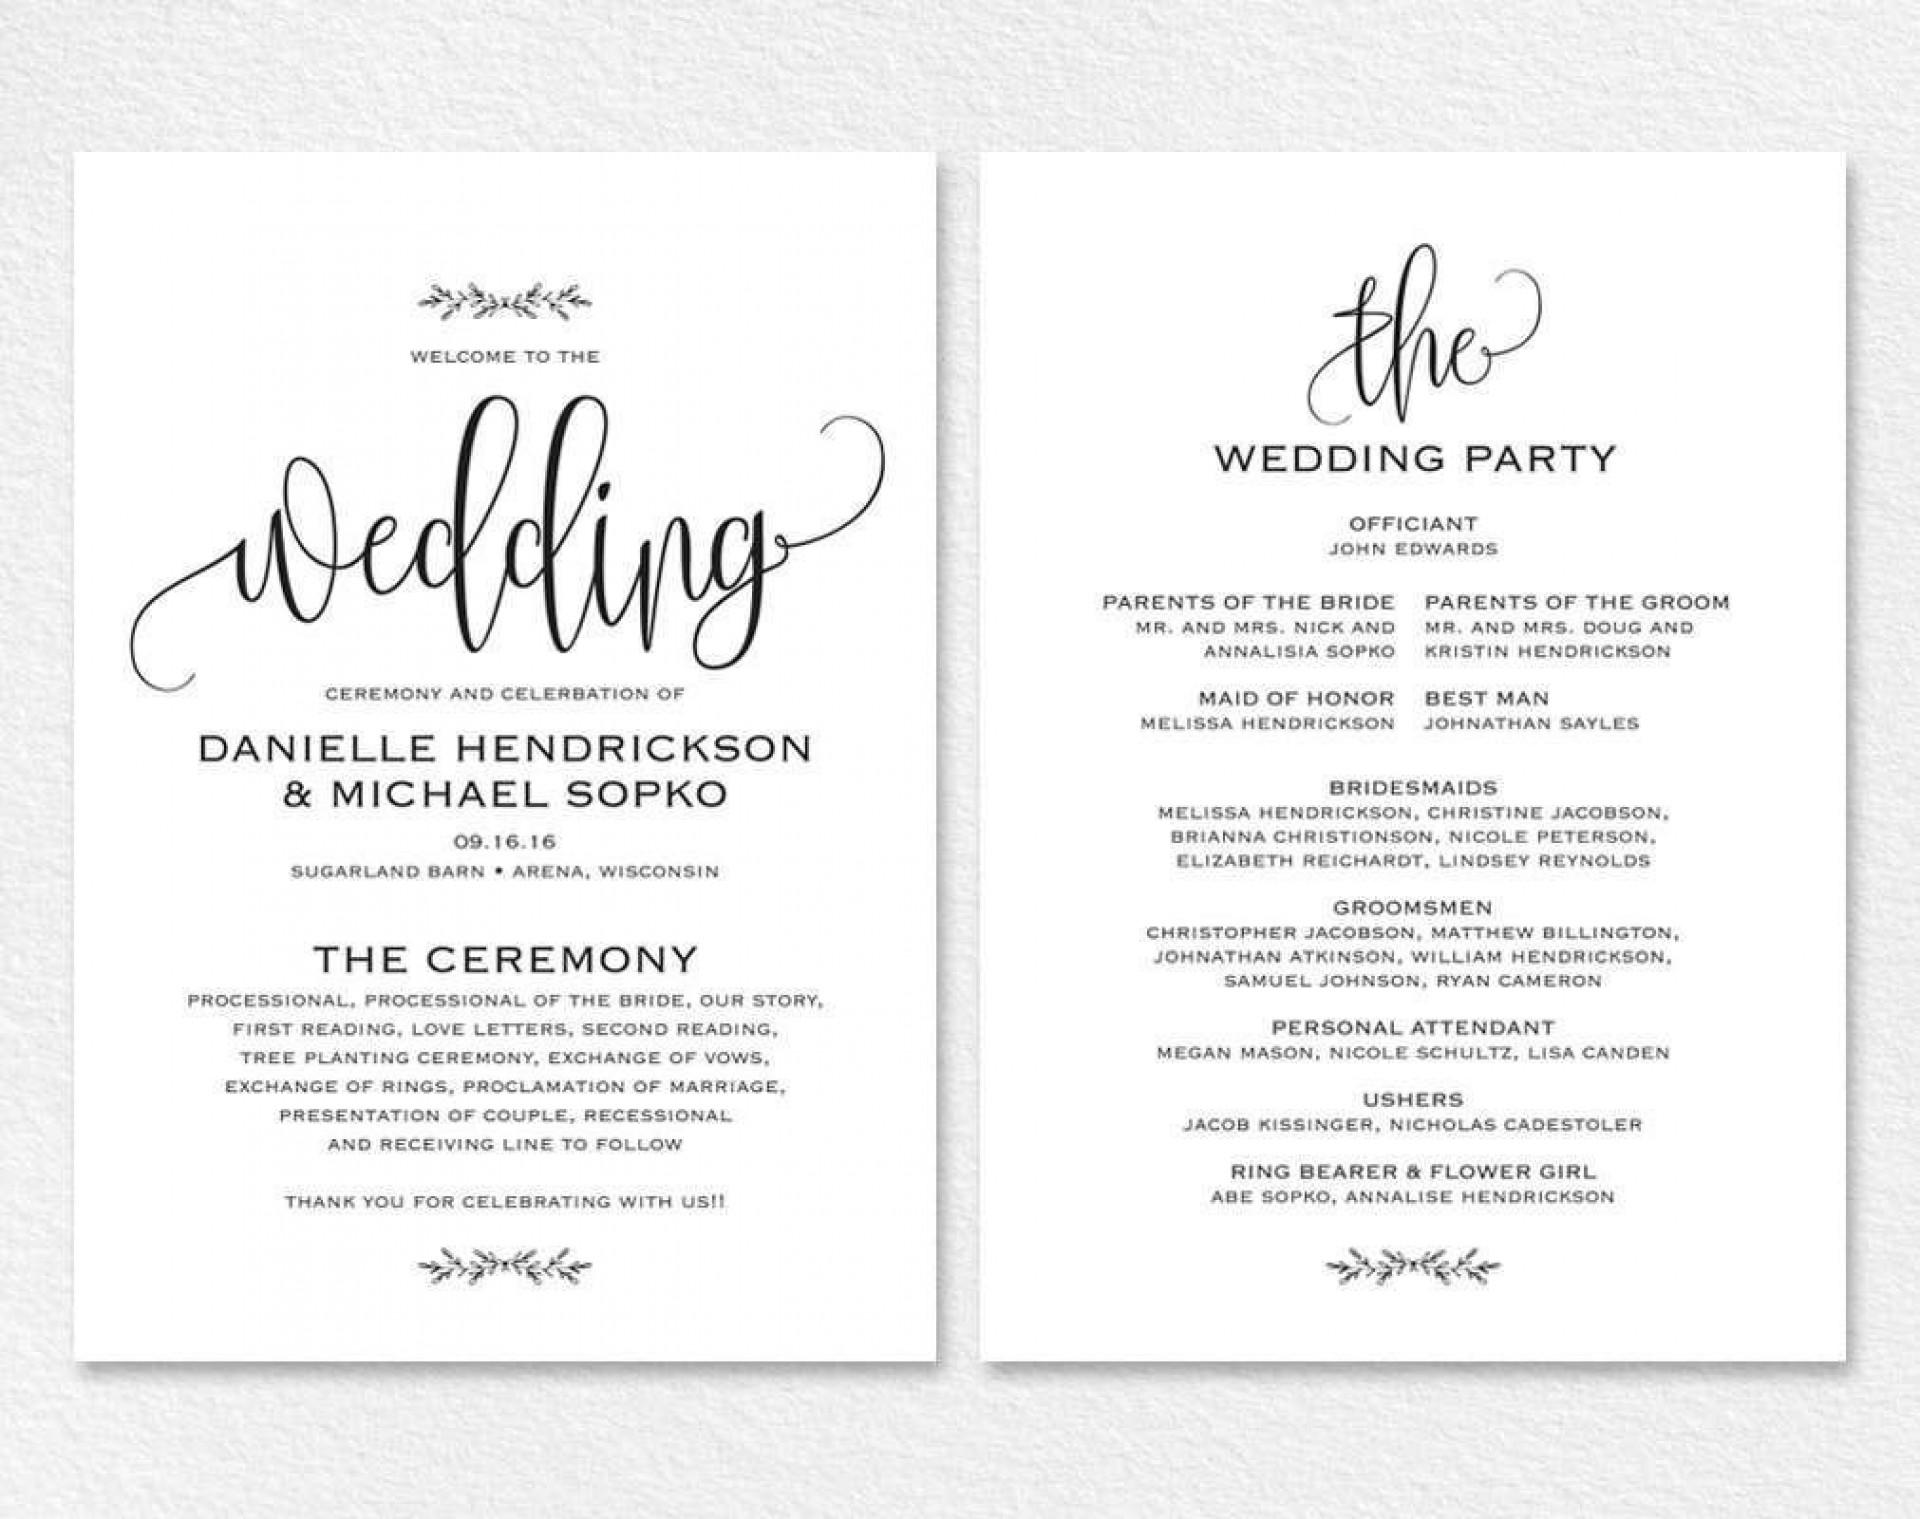 001 Impressive Invitation Template For Word Idea  Birthday Wedding Free Indian1920